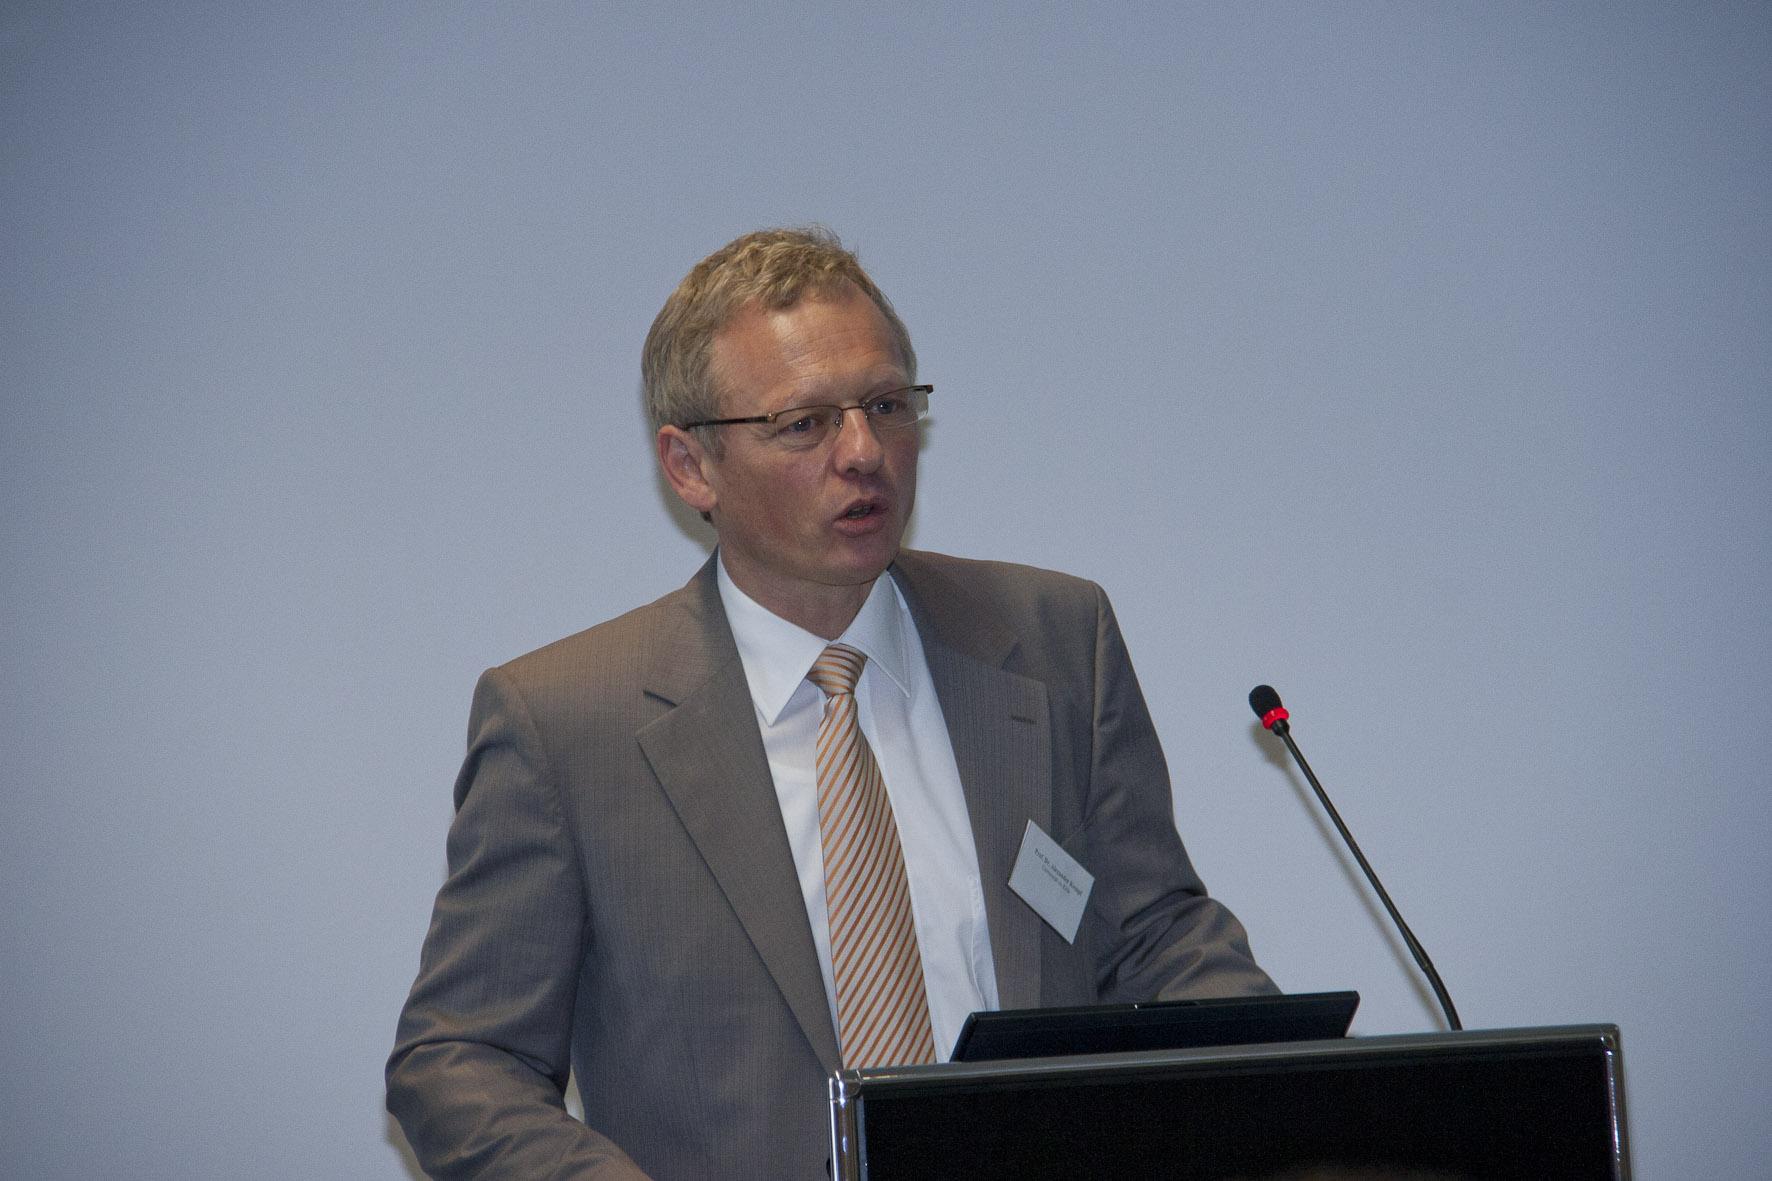 Prof dr alexander kempf universität zu köln eröffnet die